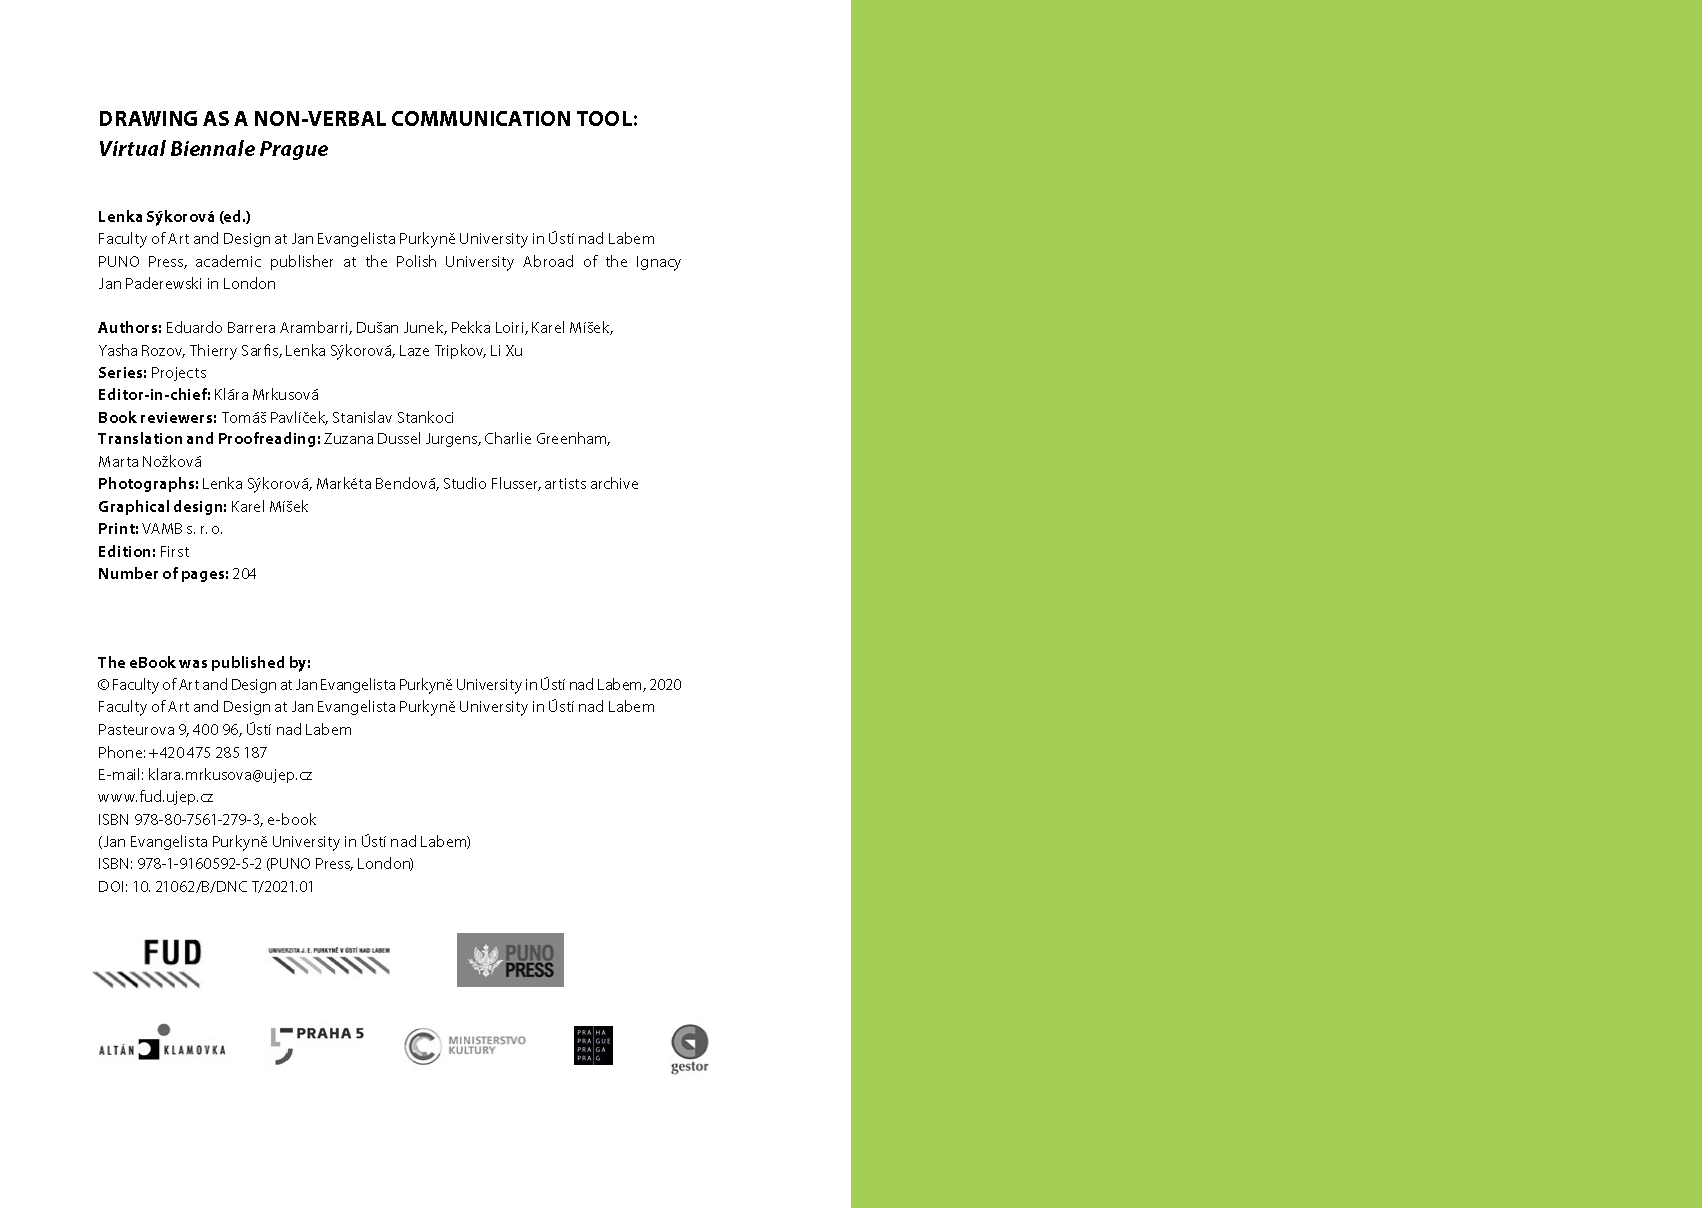 drawing-as-non-verbal-communication-tool-sykorova-editor-e-book_stranka_102